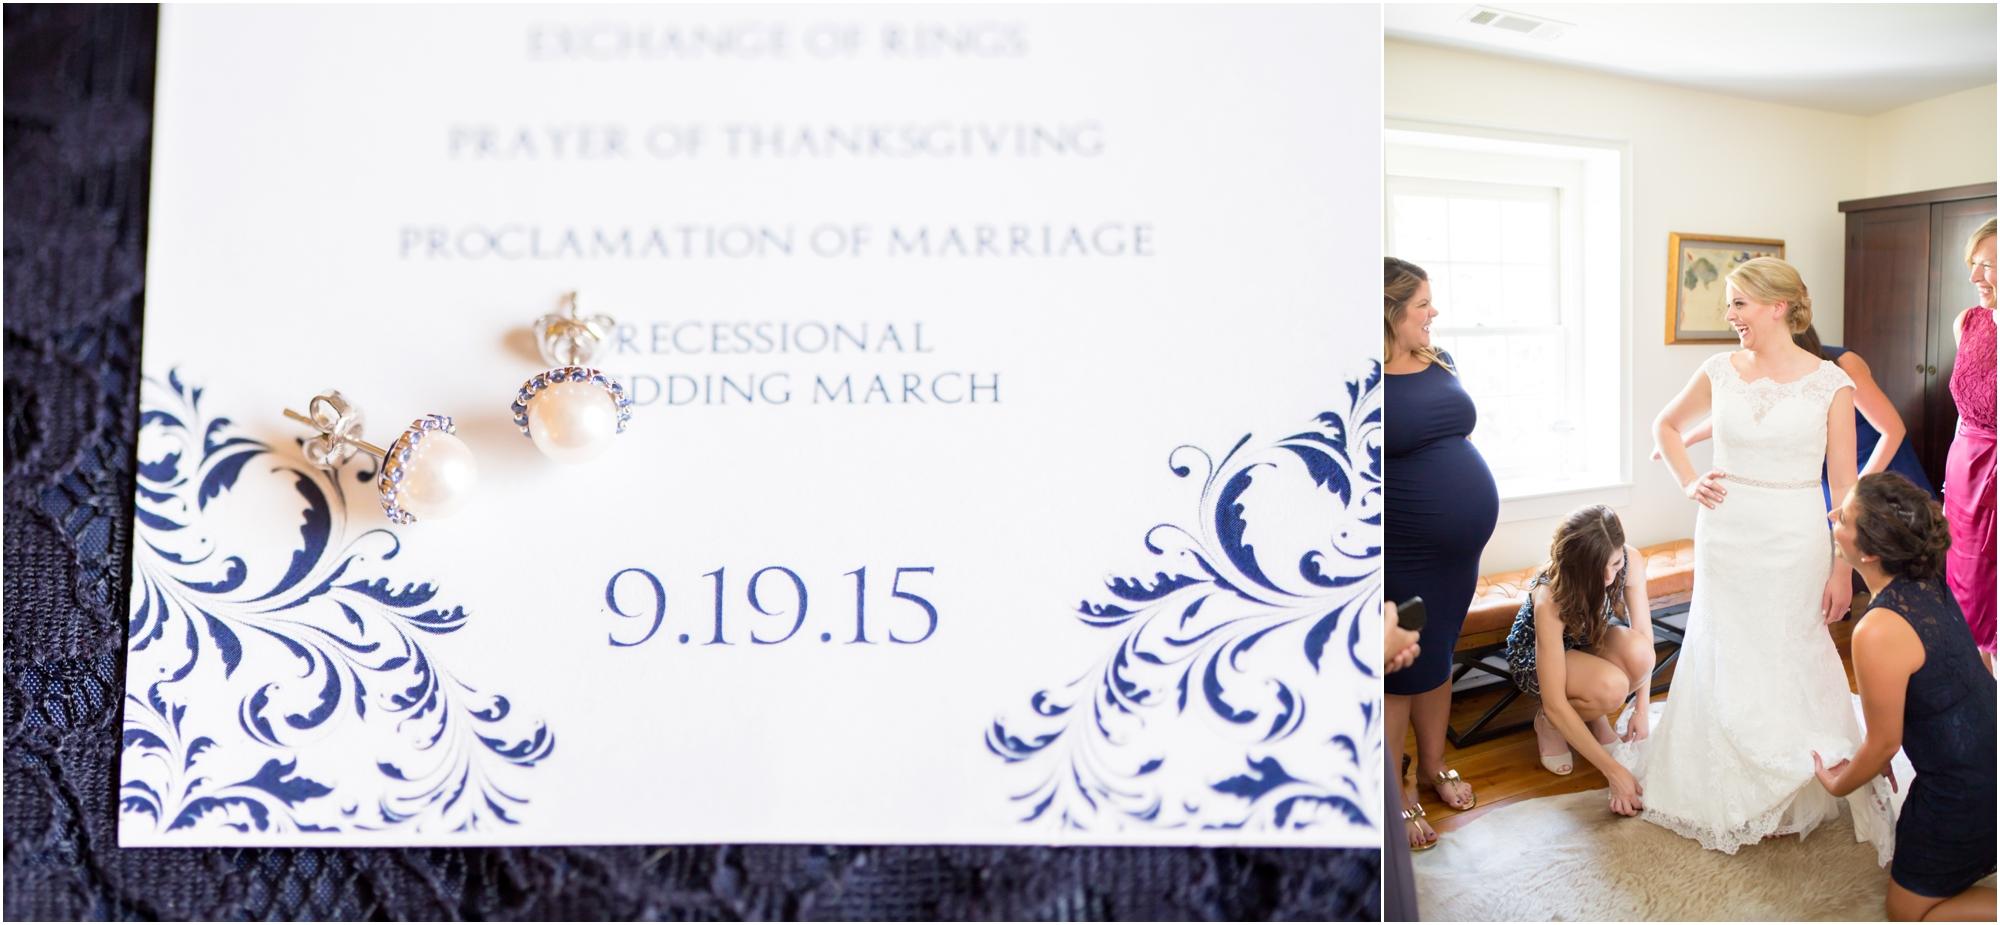 1-Miano Wedding Getting Ready-120_anna grace photography maryland wedding photographer rockland estates.jpg